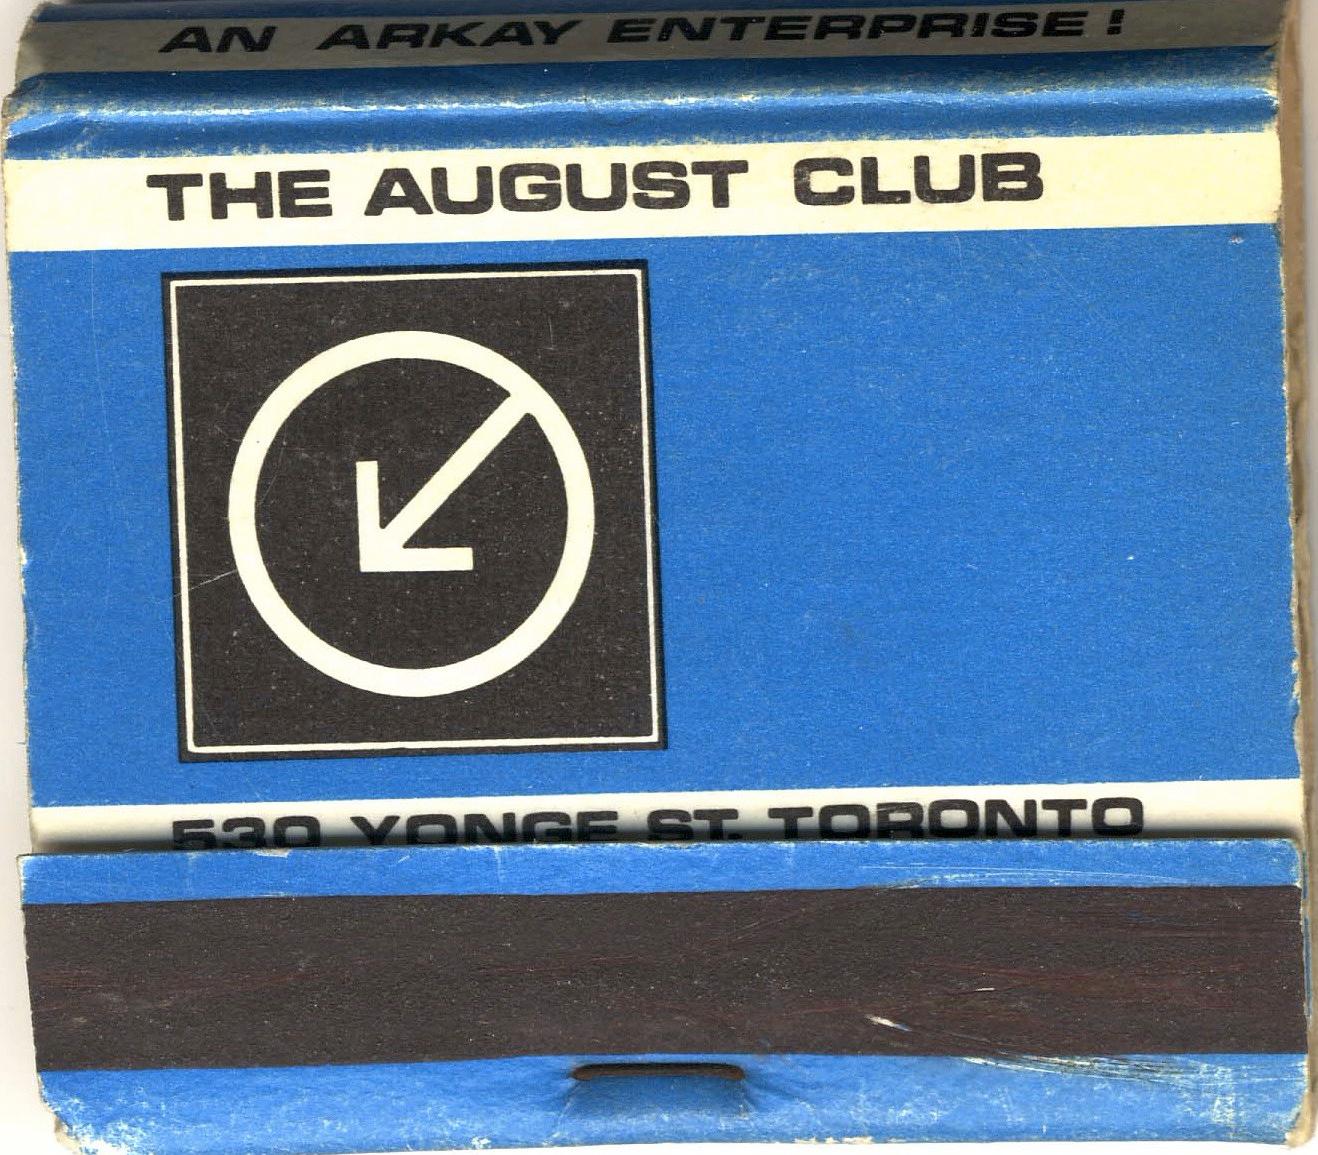 August Club